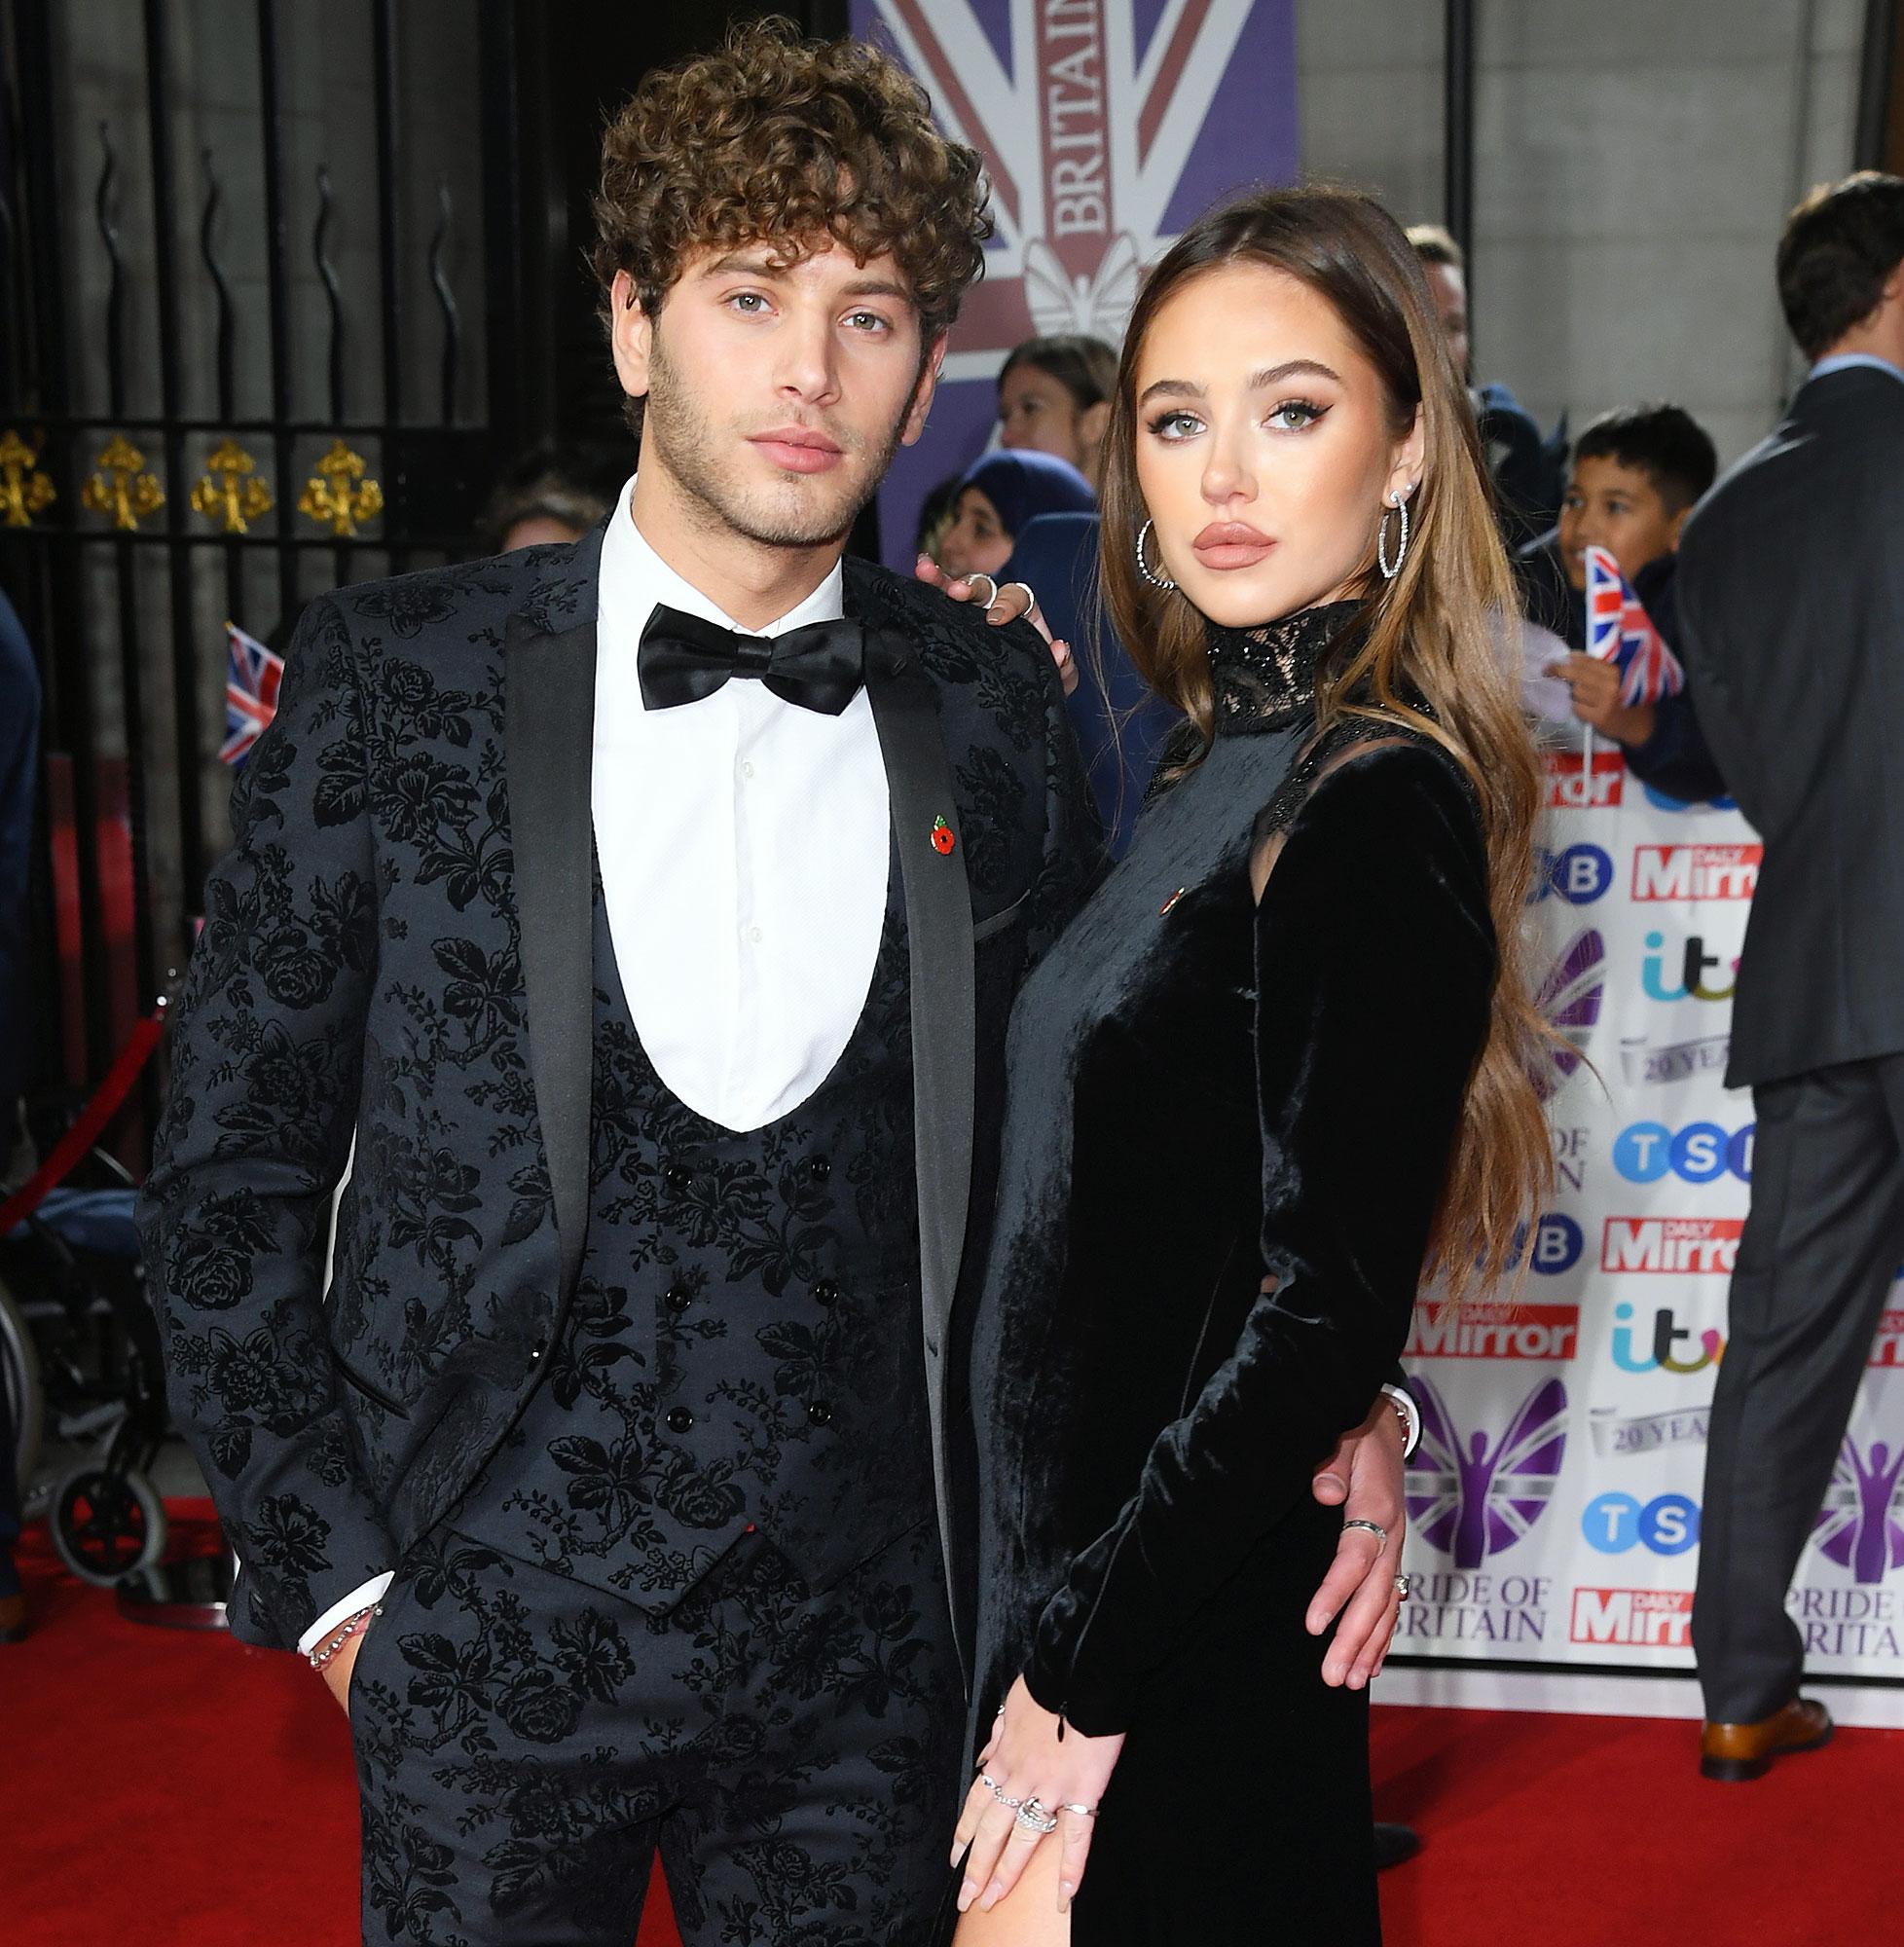 Eyal Booker and Delilah Hamlin attend the Pride of Britain Awards Megan Barton-Hanson Hits Back at Scott Disick Over Delilah Hamlin Boyfriend Eyal Booker